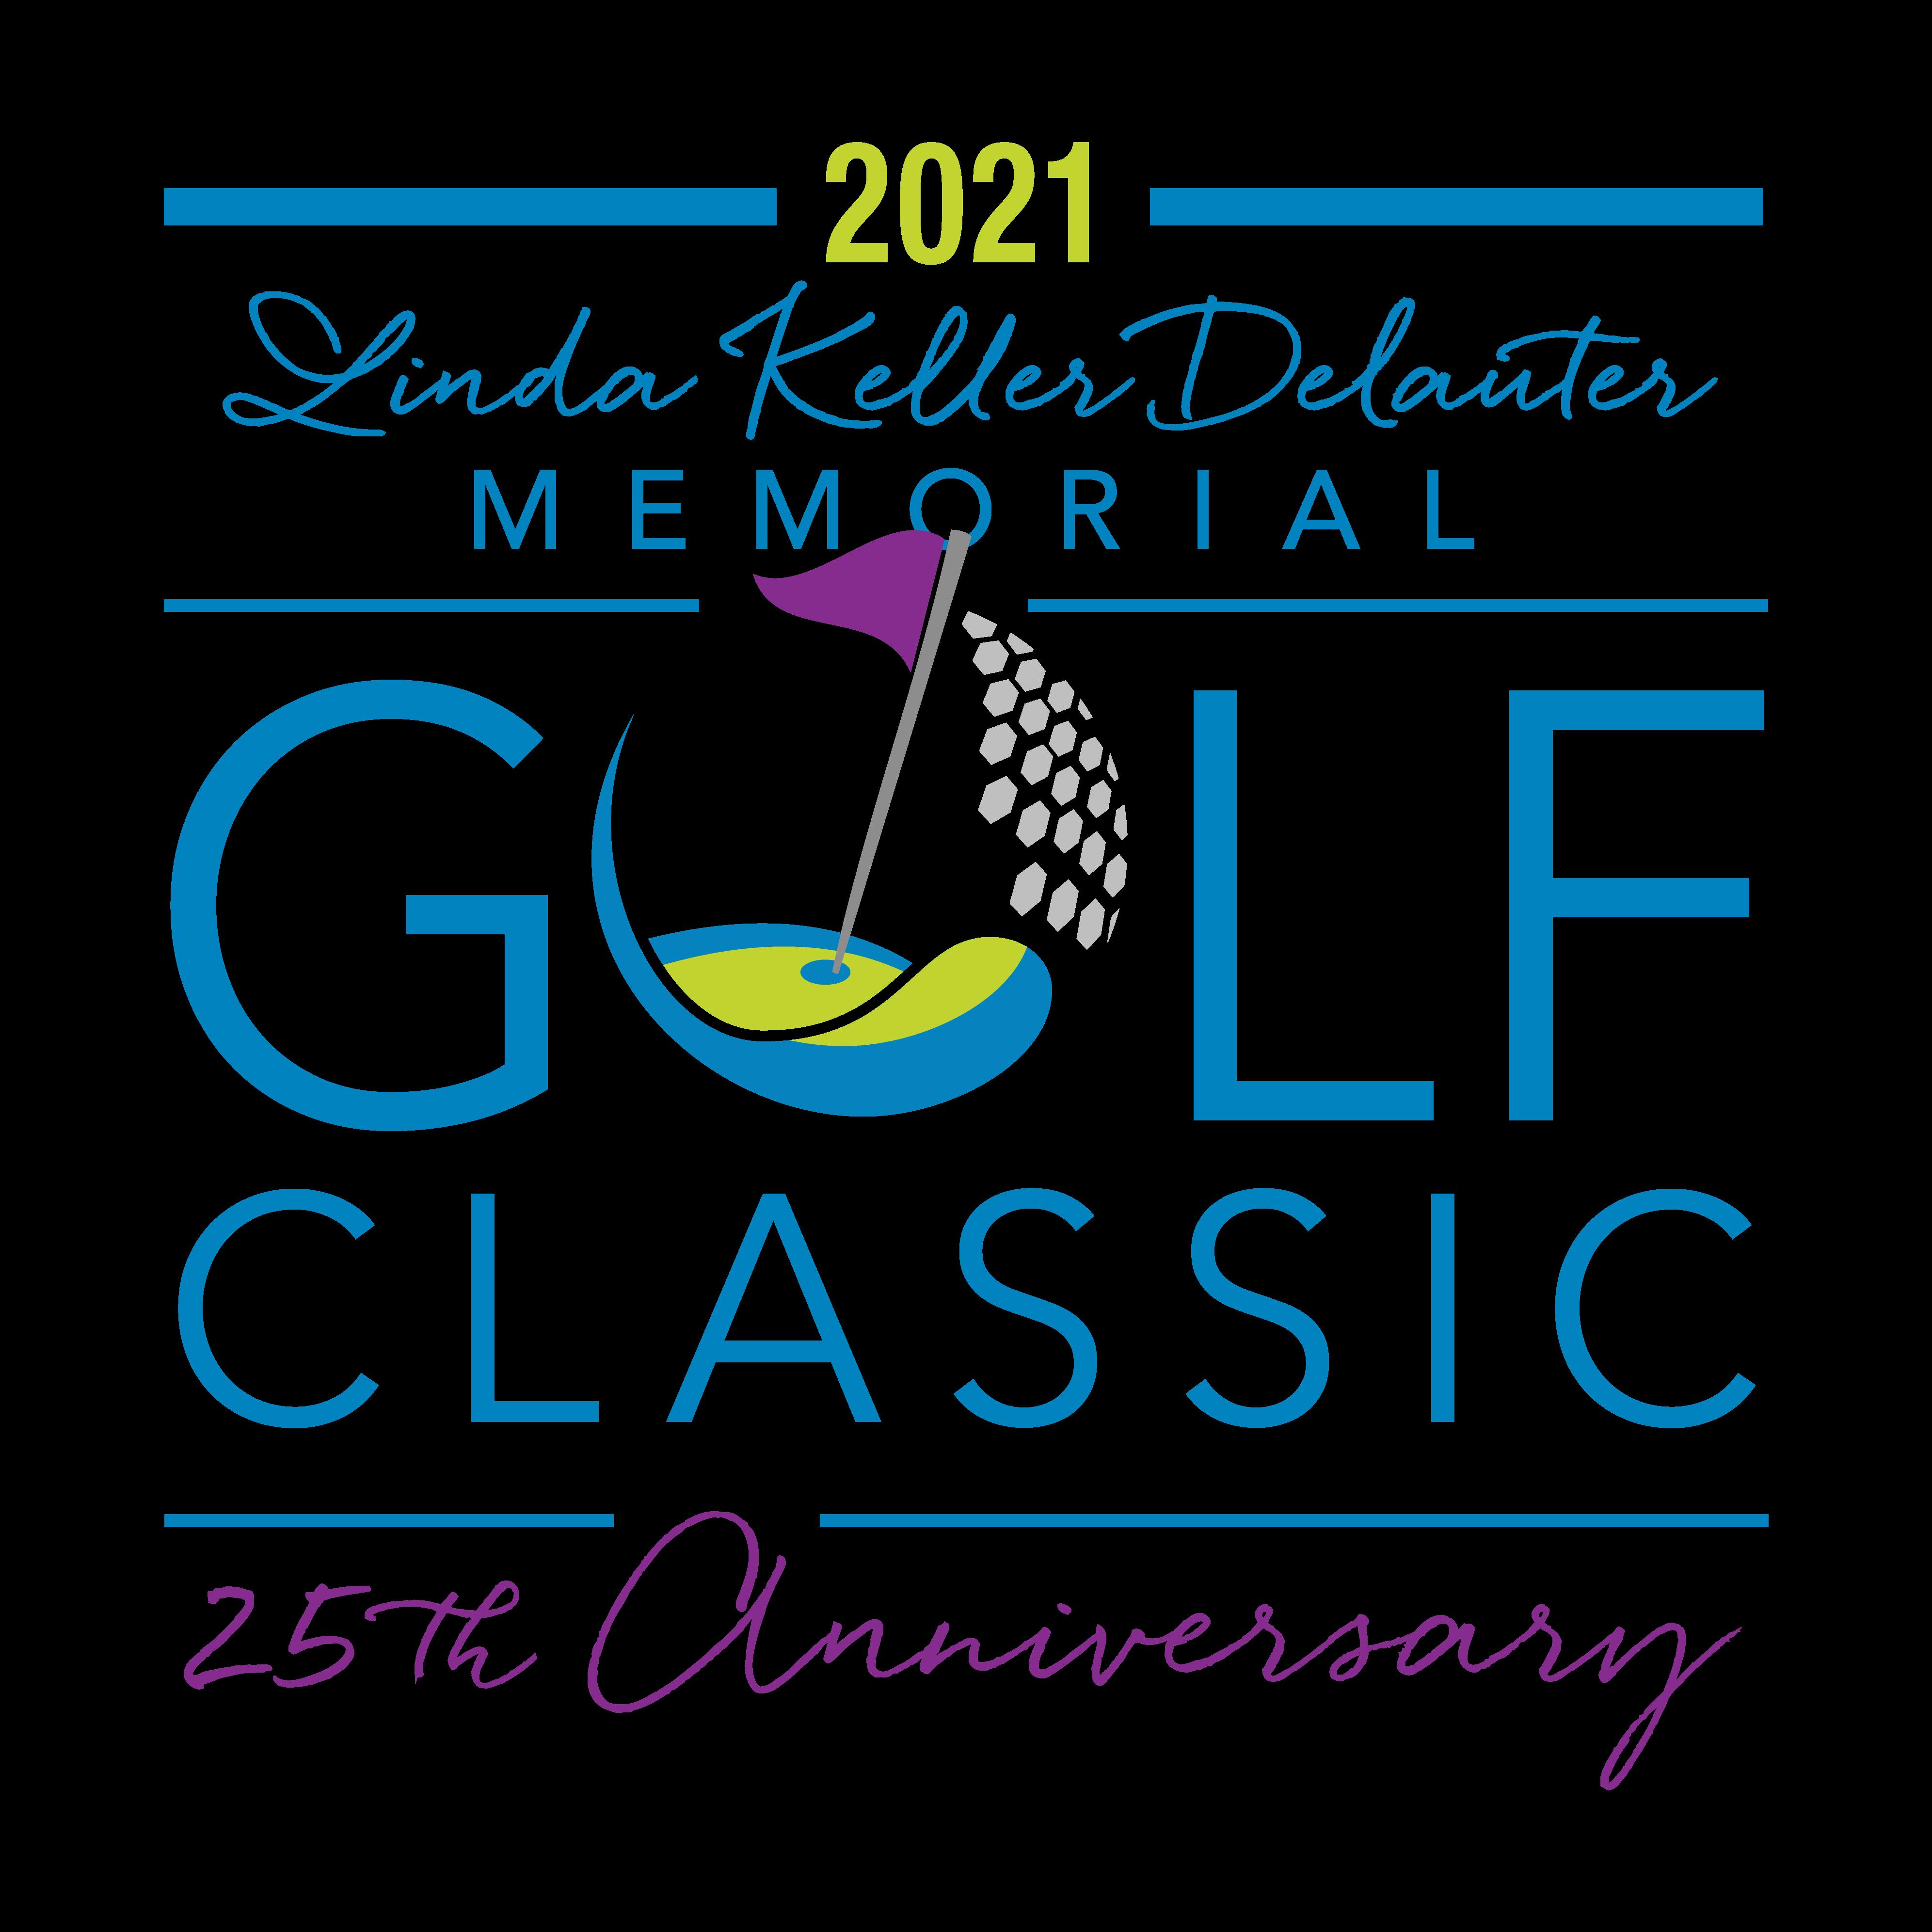 Linda Keller Delauter Memorial Gold Classic 25th Anniversary Logo